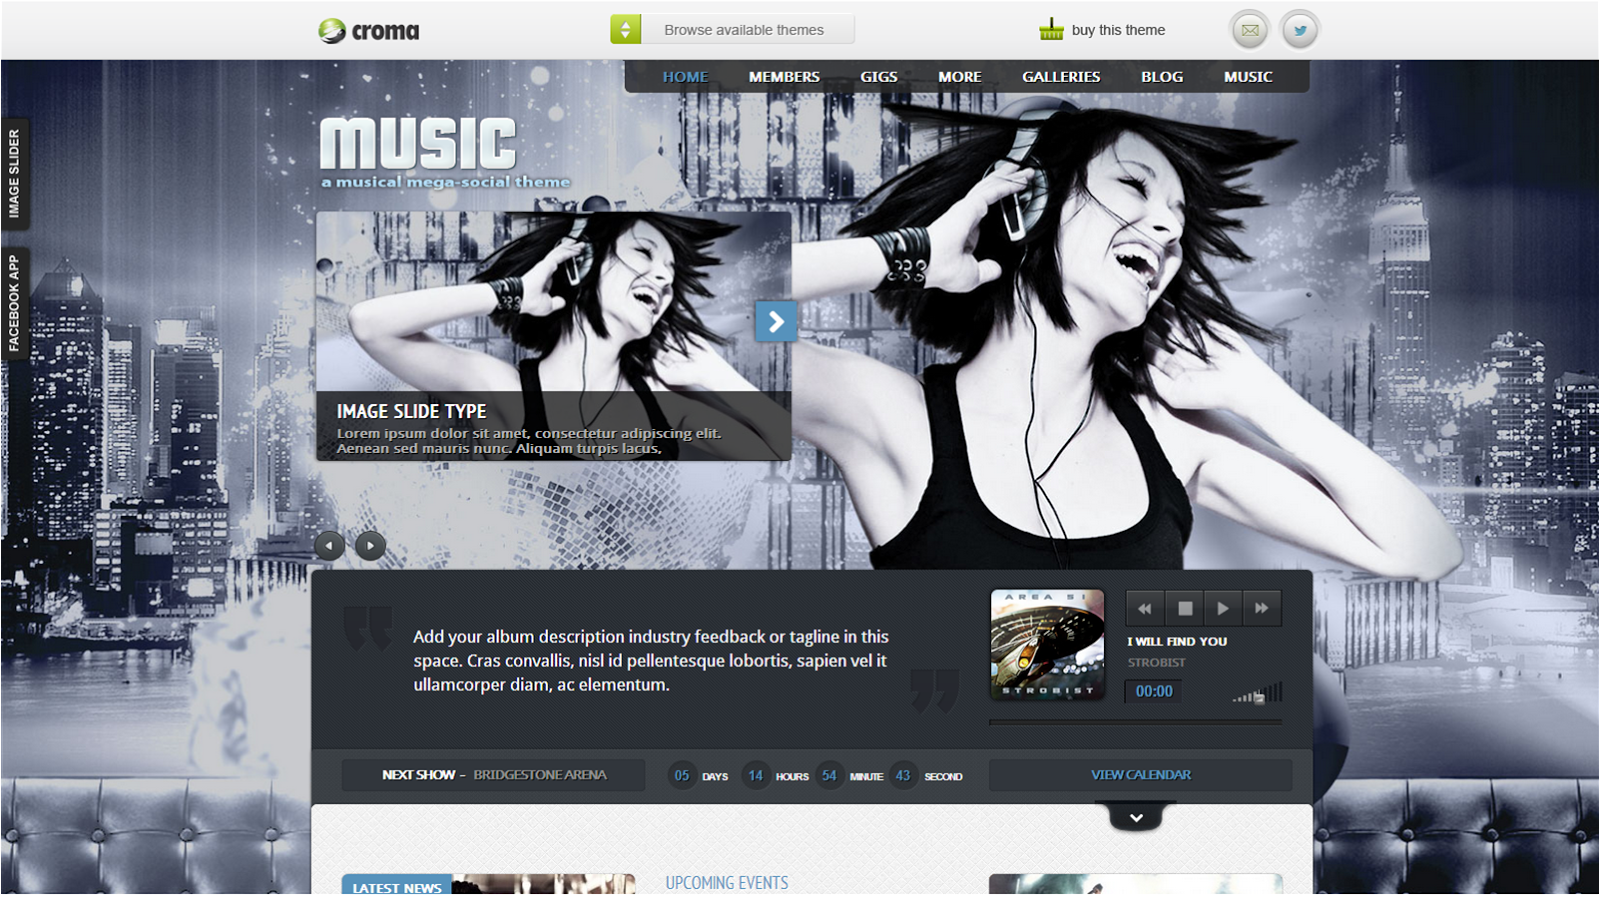 Top Best WordPress Music Themes 2013 | Top WordPress Themes 2013